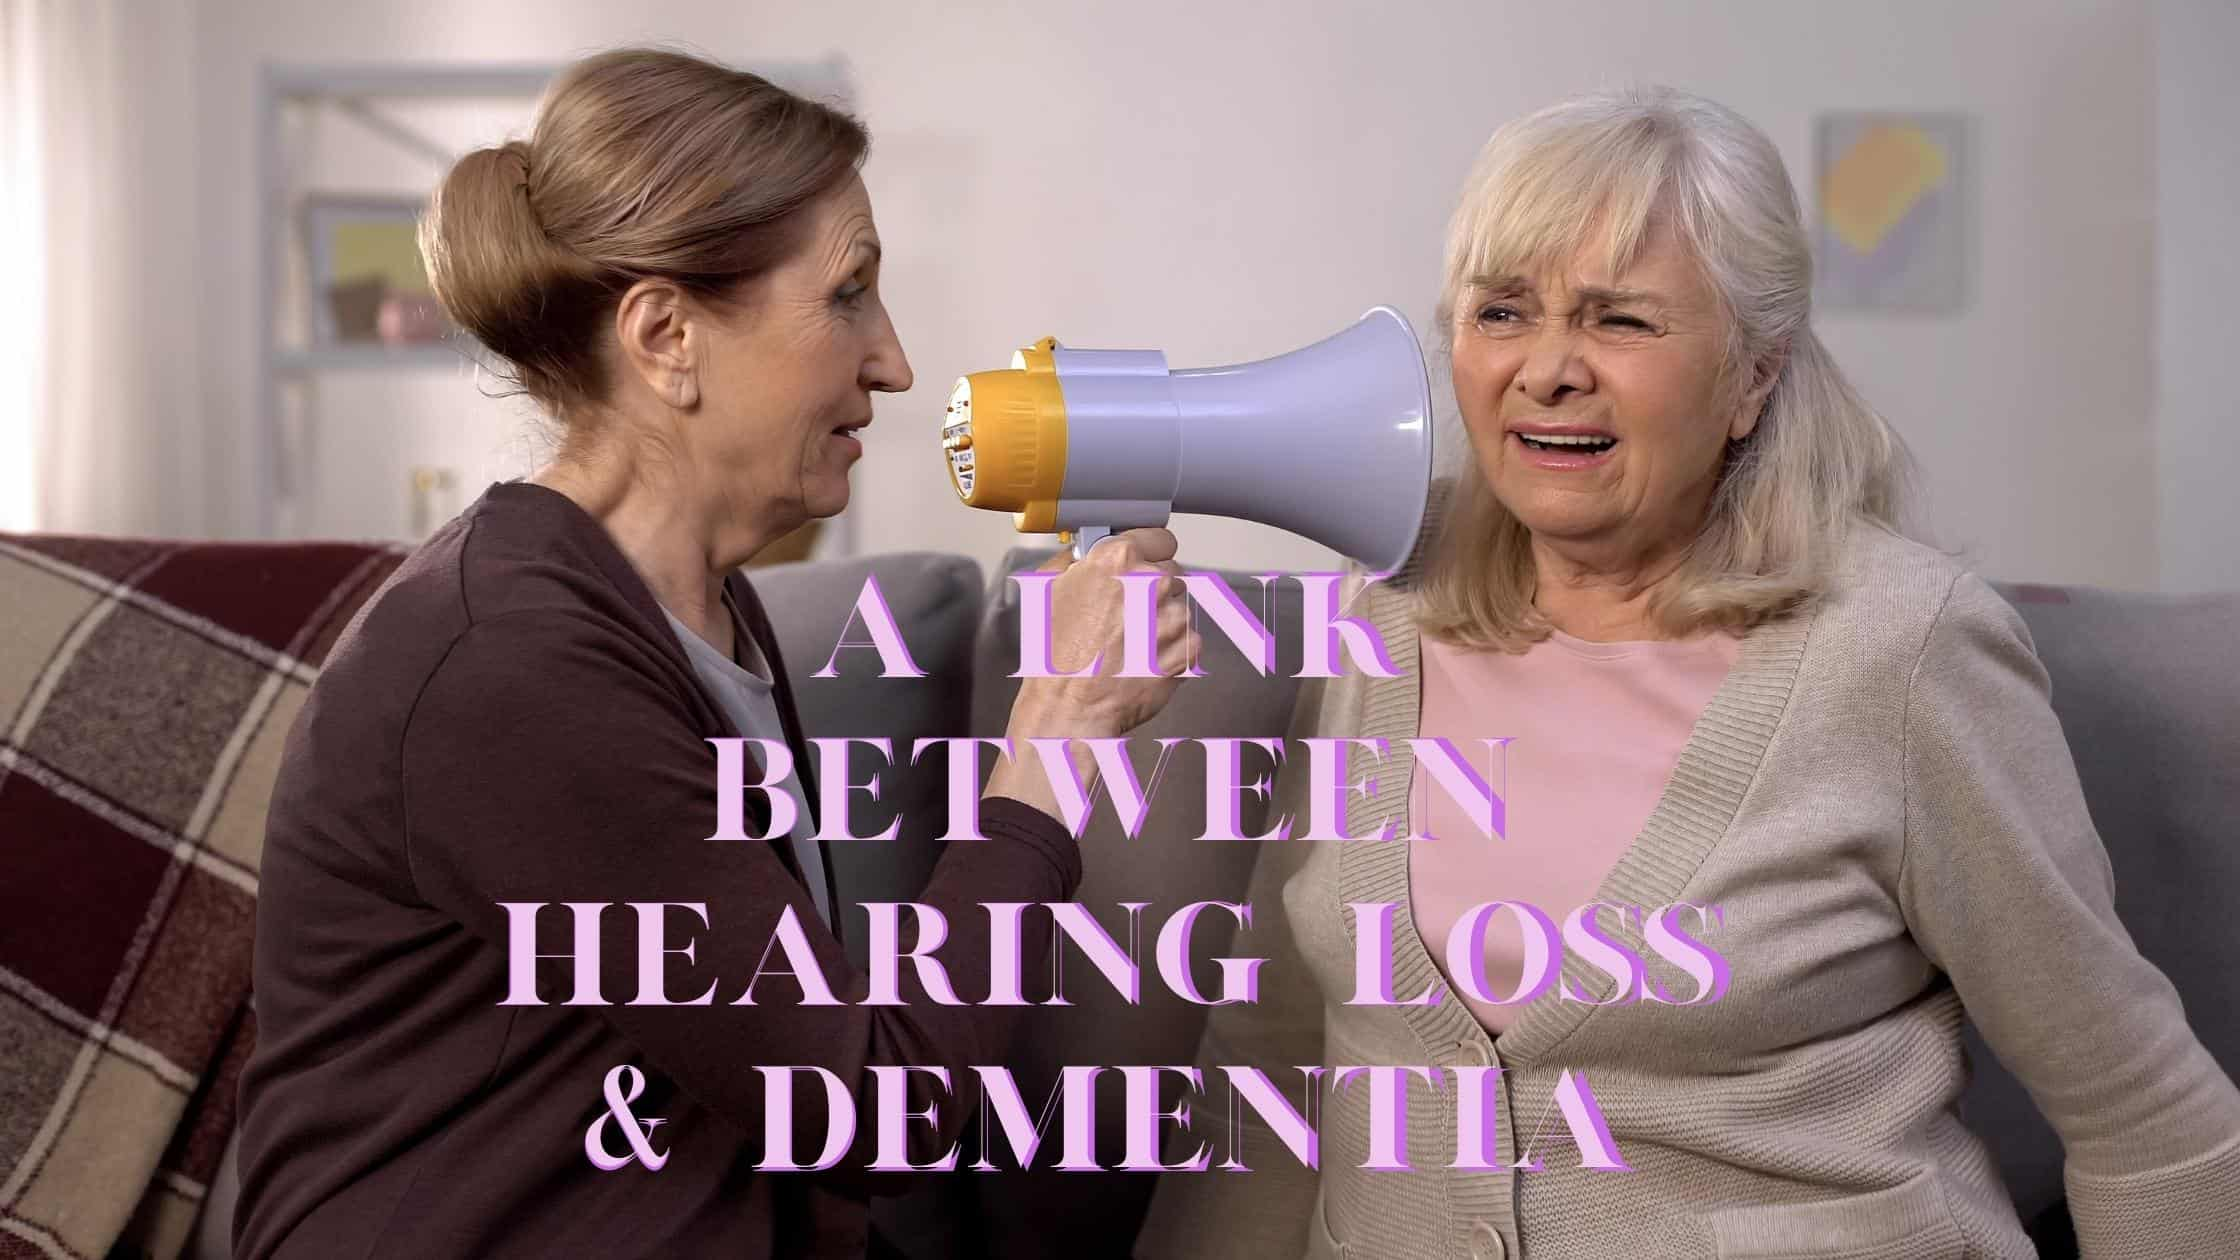 A Link Between Hearing Loss & Dementia